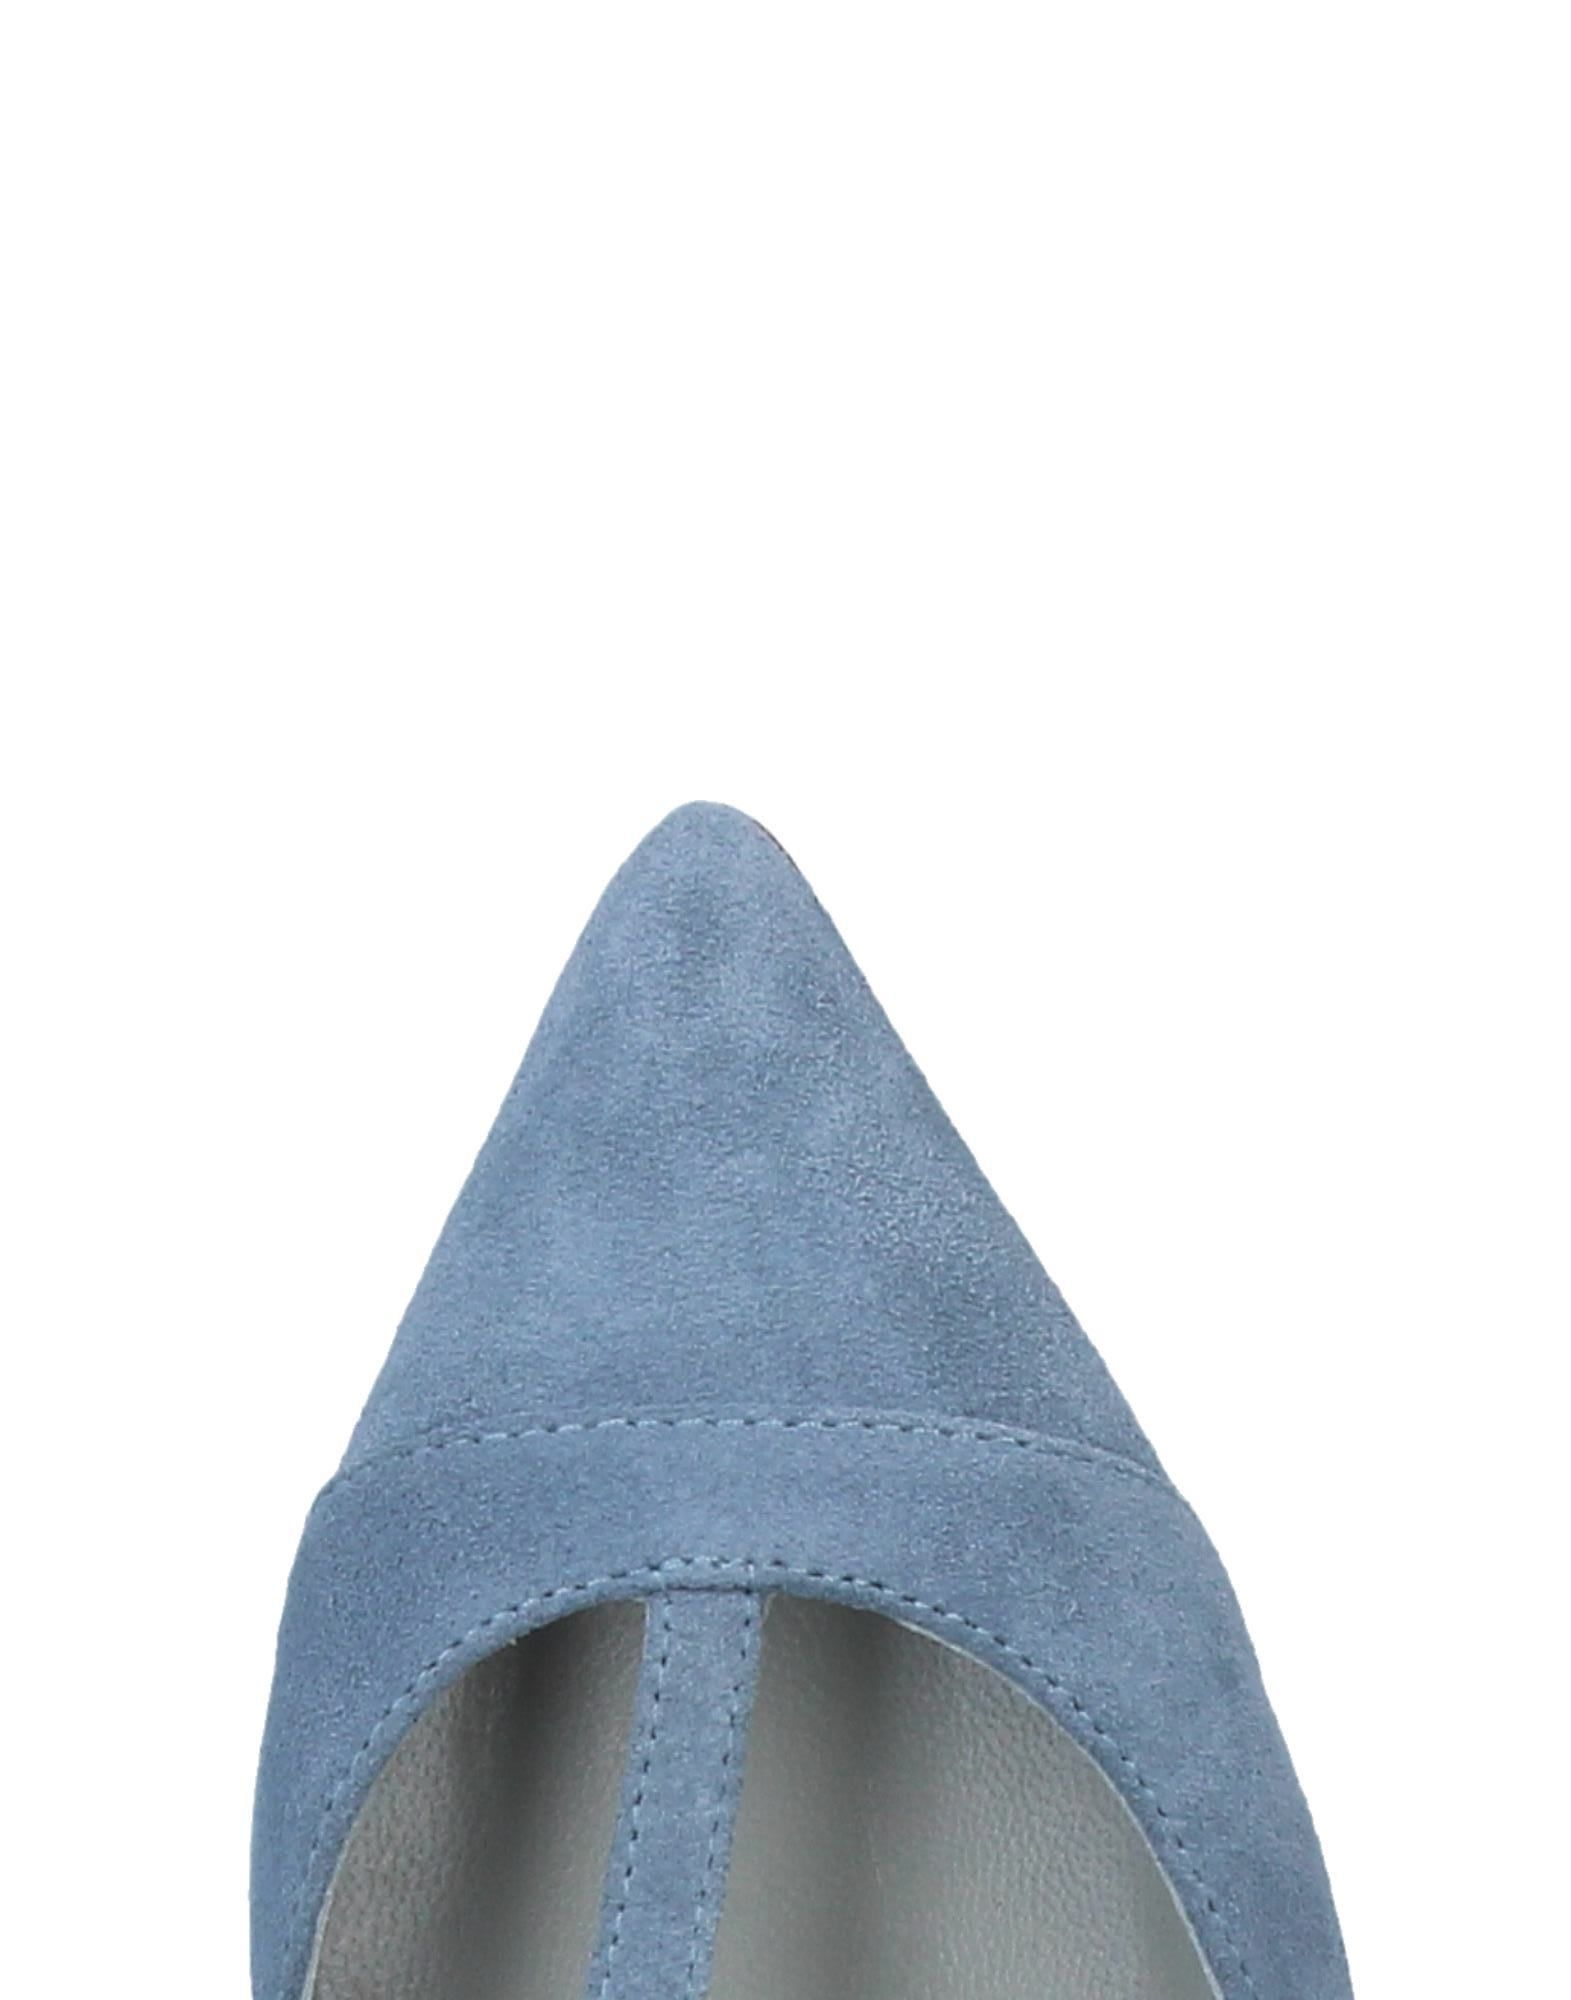 Emanuela Passeri Pumps Damen Gute  11331768AV Gute Damen Qualität beliebte Schuhe ee2915